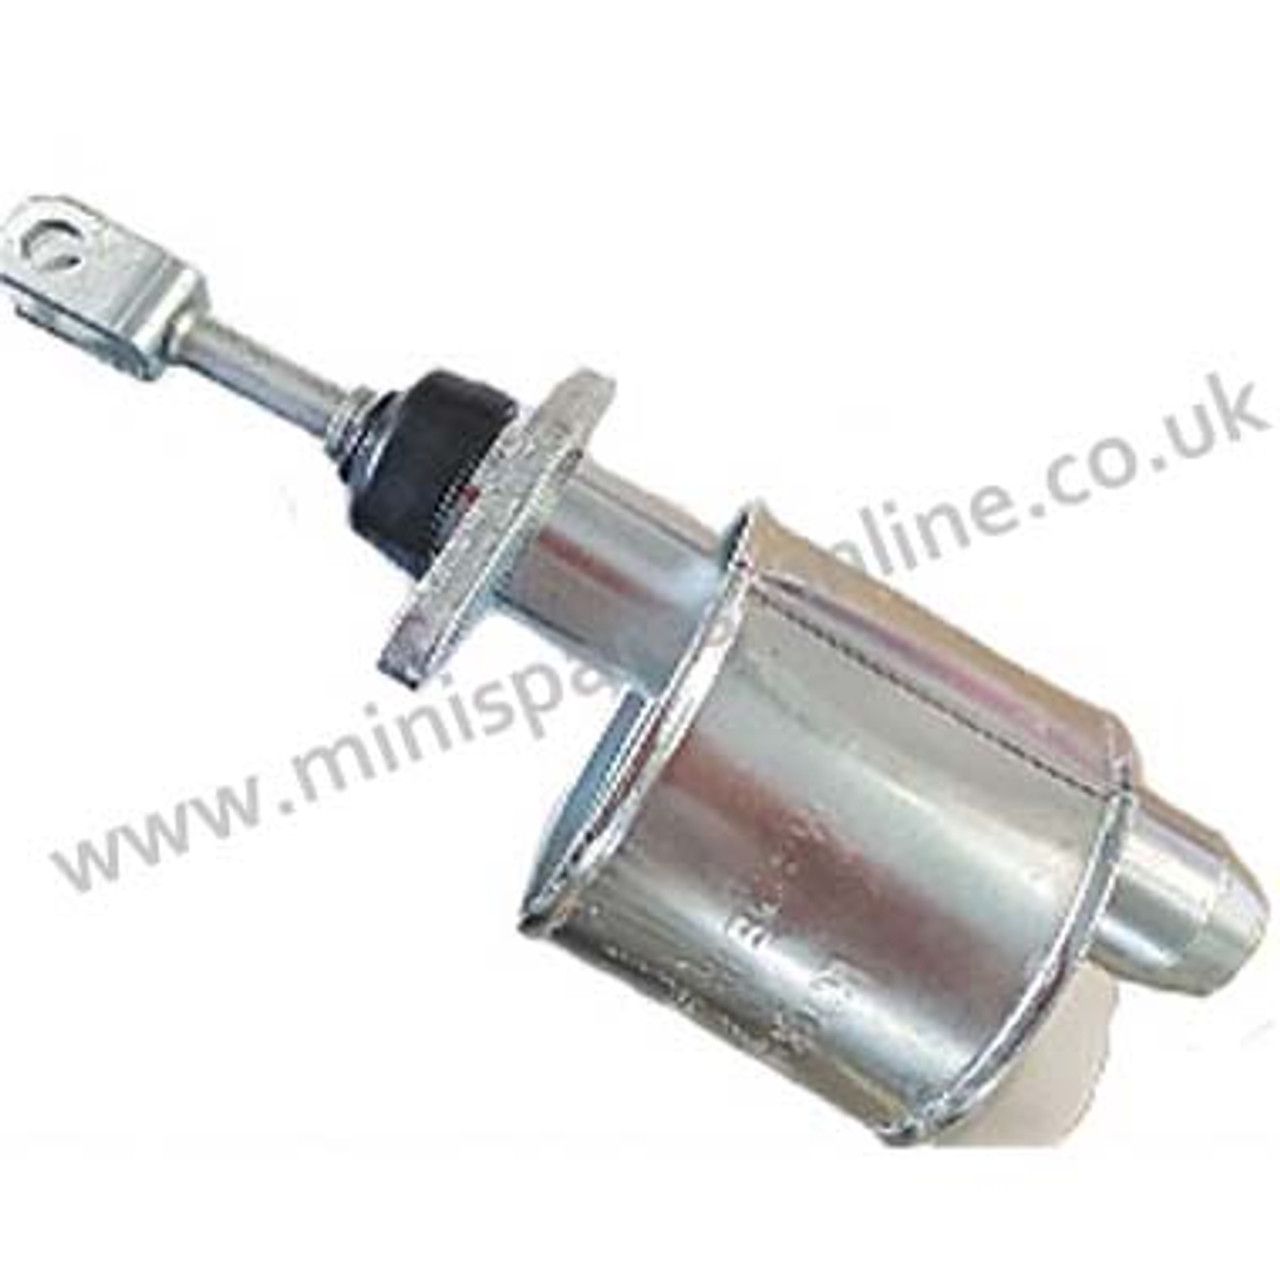 Clutch master cylinder tin type Lockheed